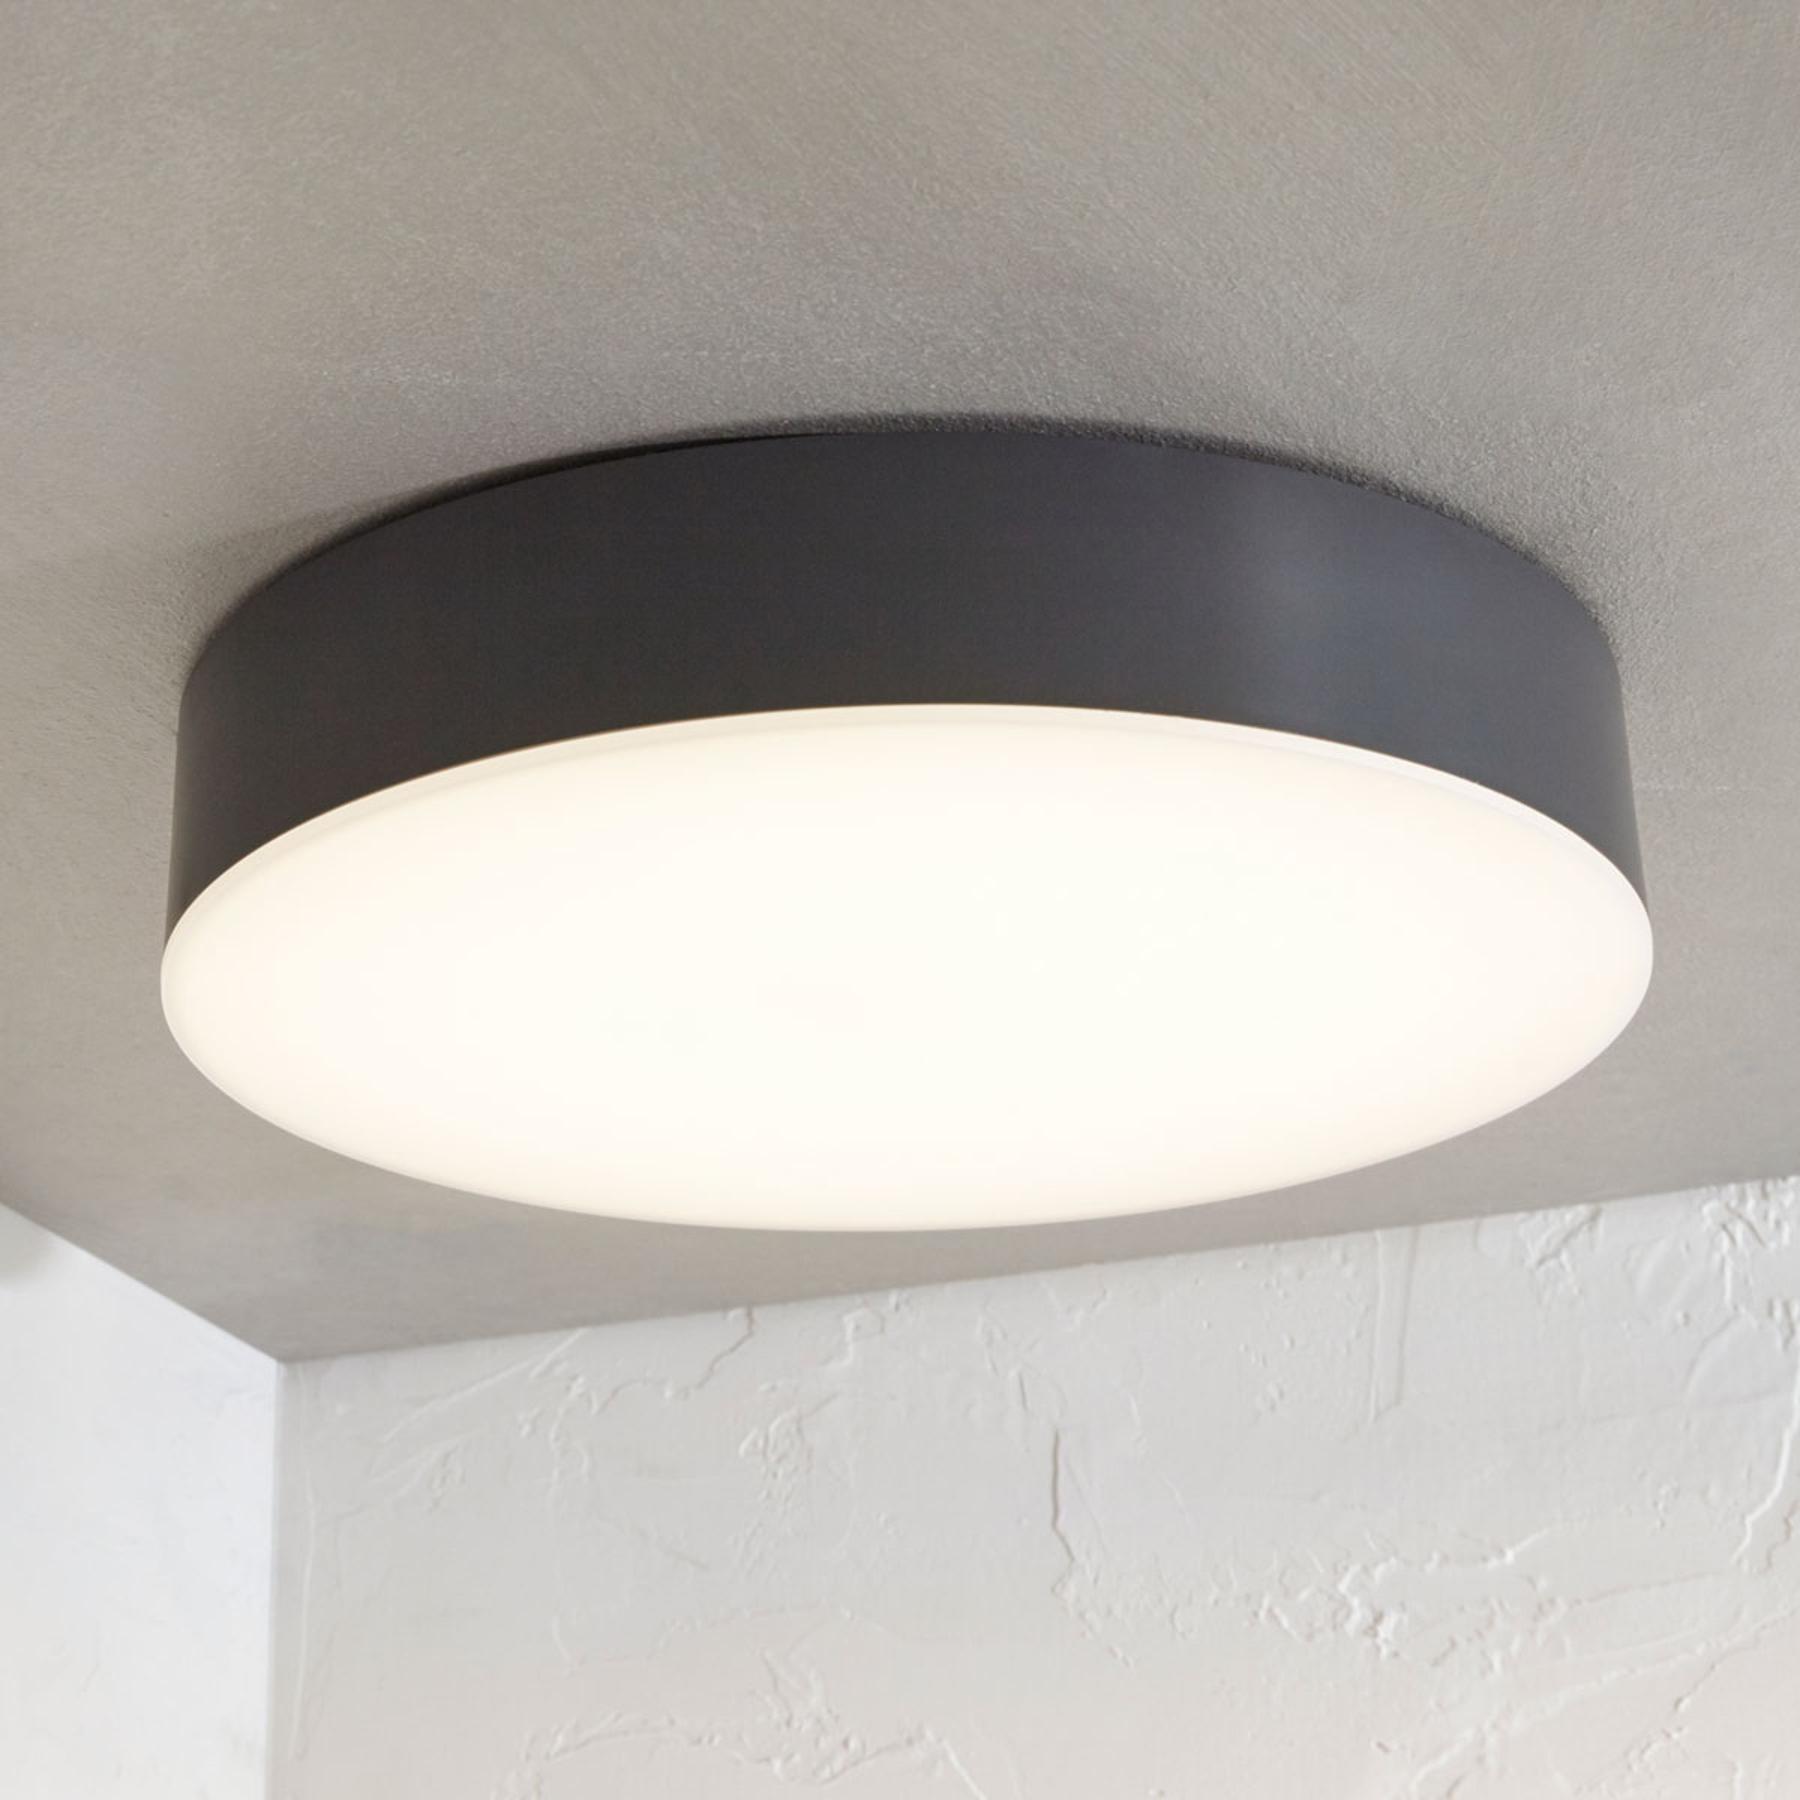 Plafoniera LED da esterni Lahja IP65, grigio scuro